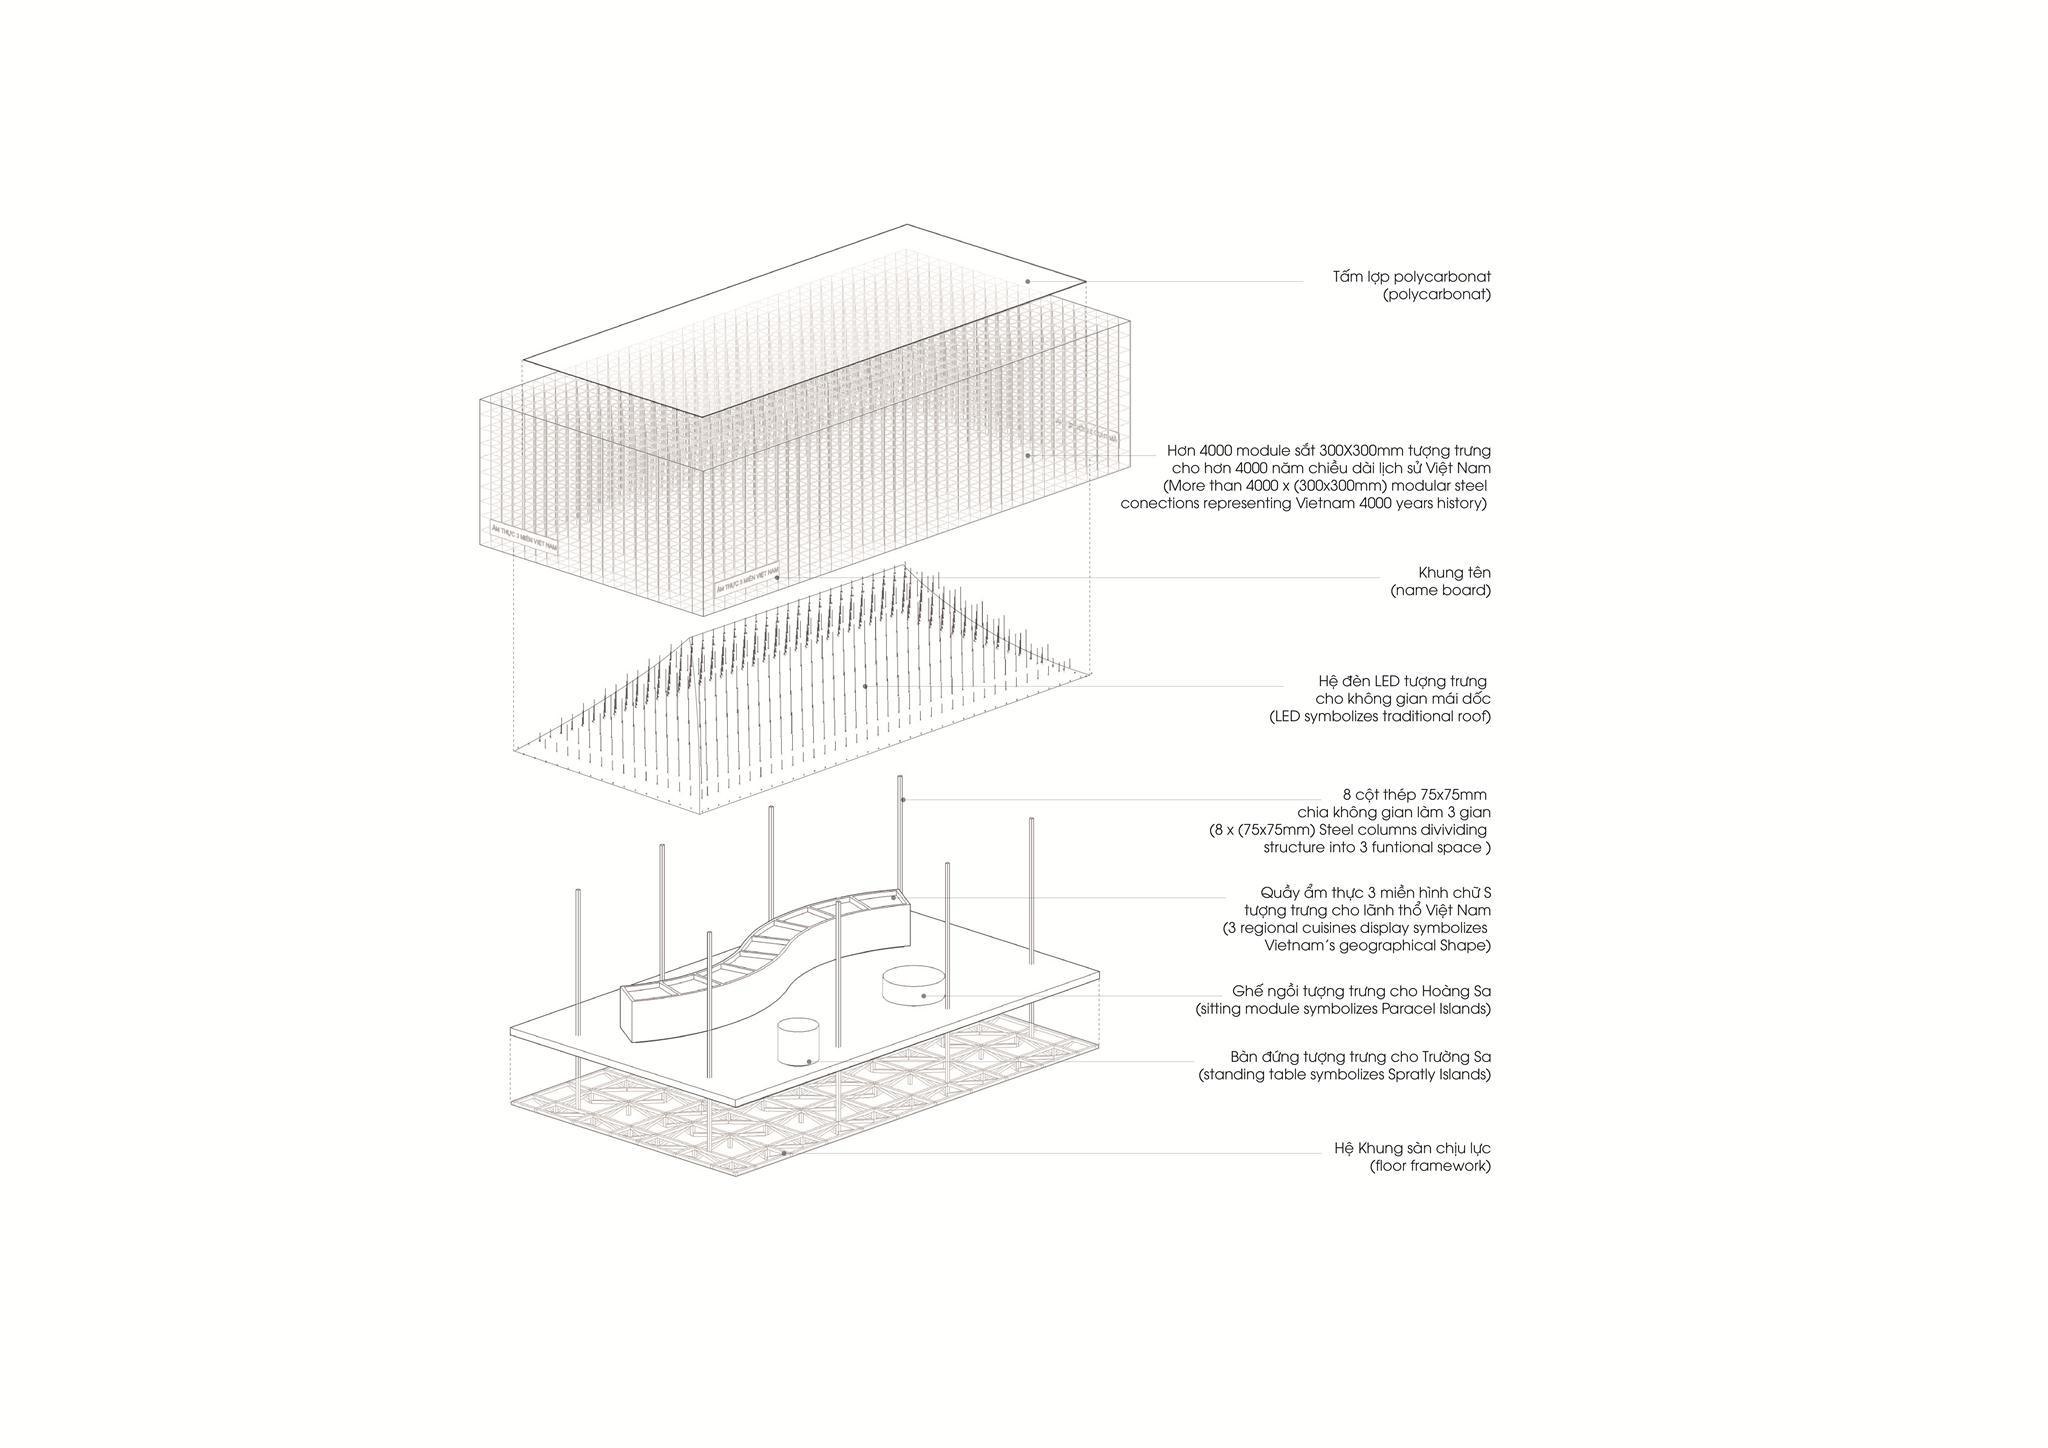 Bóc tách cấu trúc